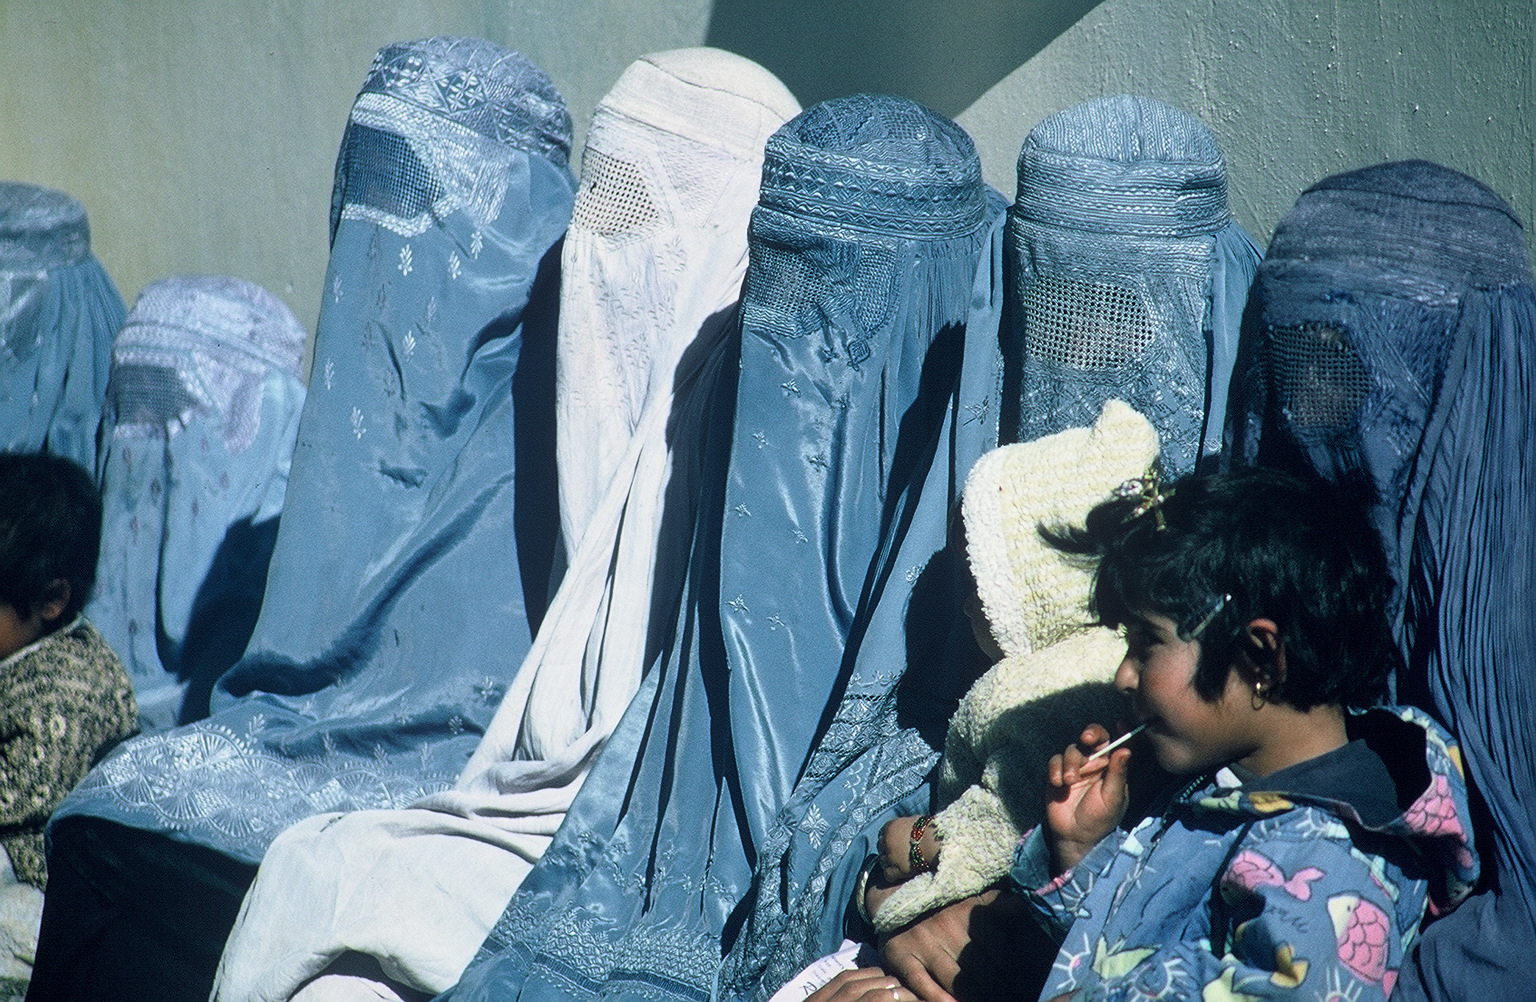 group of women wearing burkas